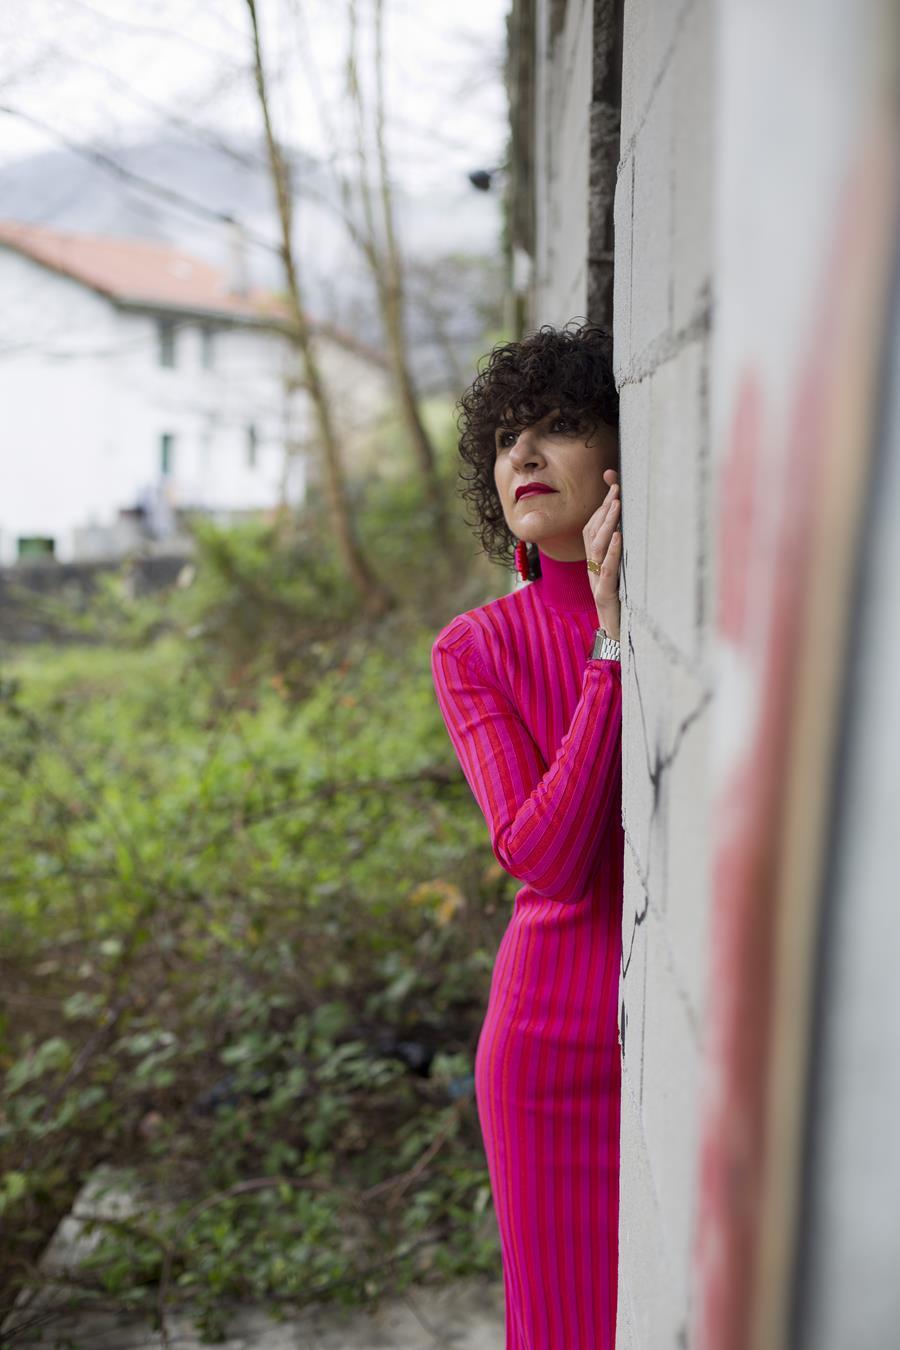 Rebeca Valdivia, asesora de imagen, personal shopper, estilista, stilist, influencer, Donostia, San Sebastián, Miss Clov, la blogger indie, influencer, dress, vestido canalé, rosa, pink, tomboystyle, graffitis